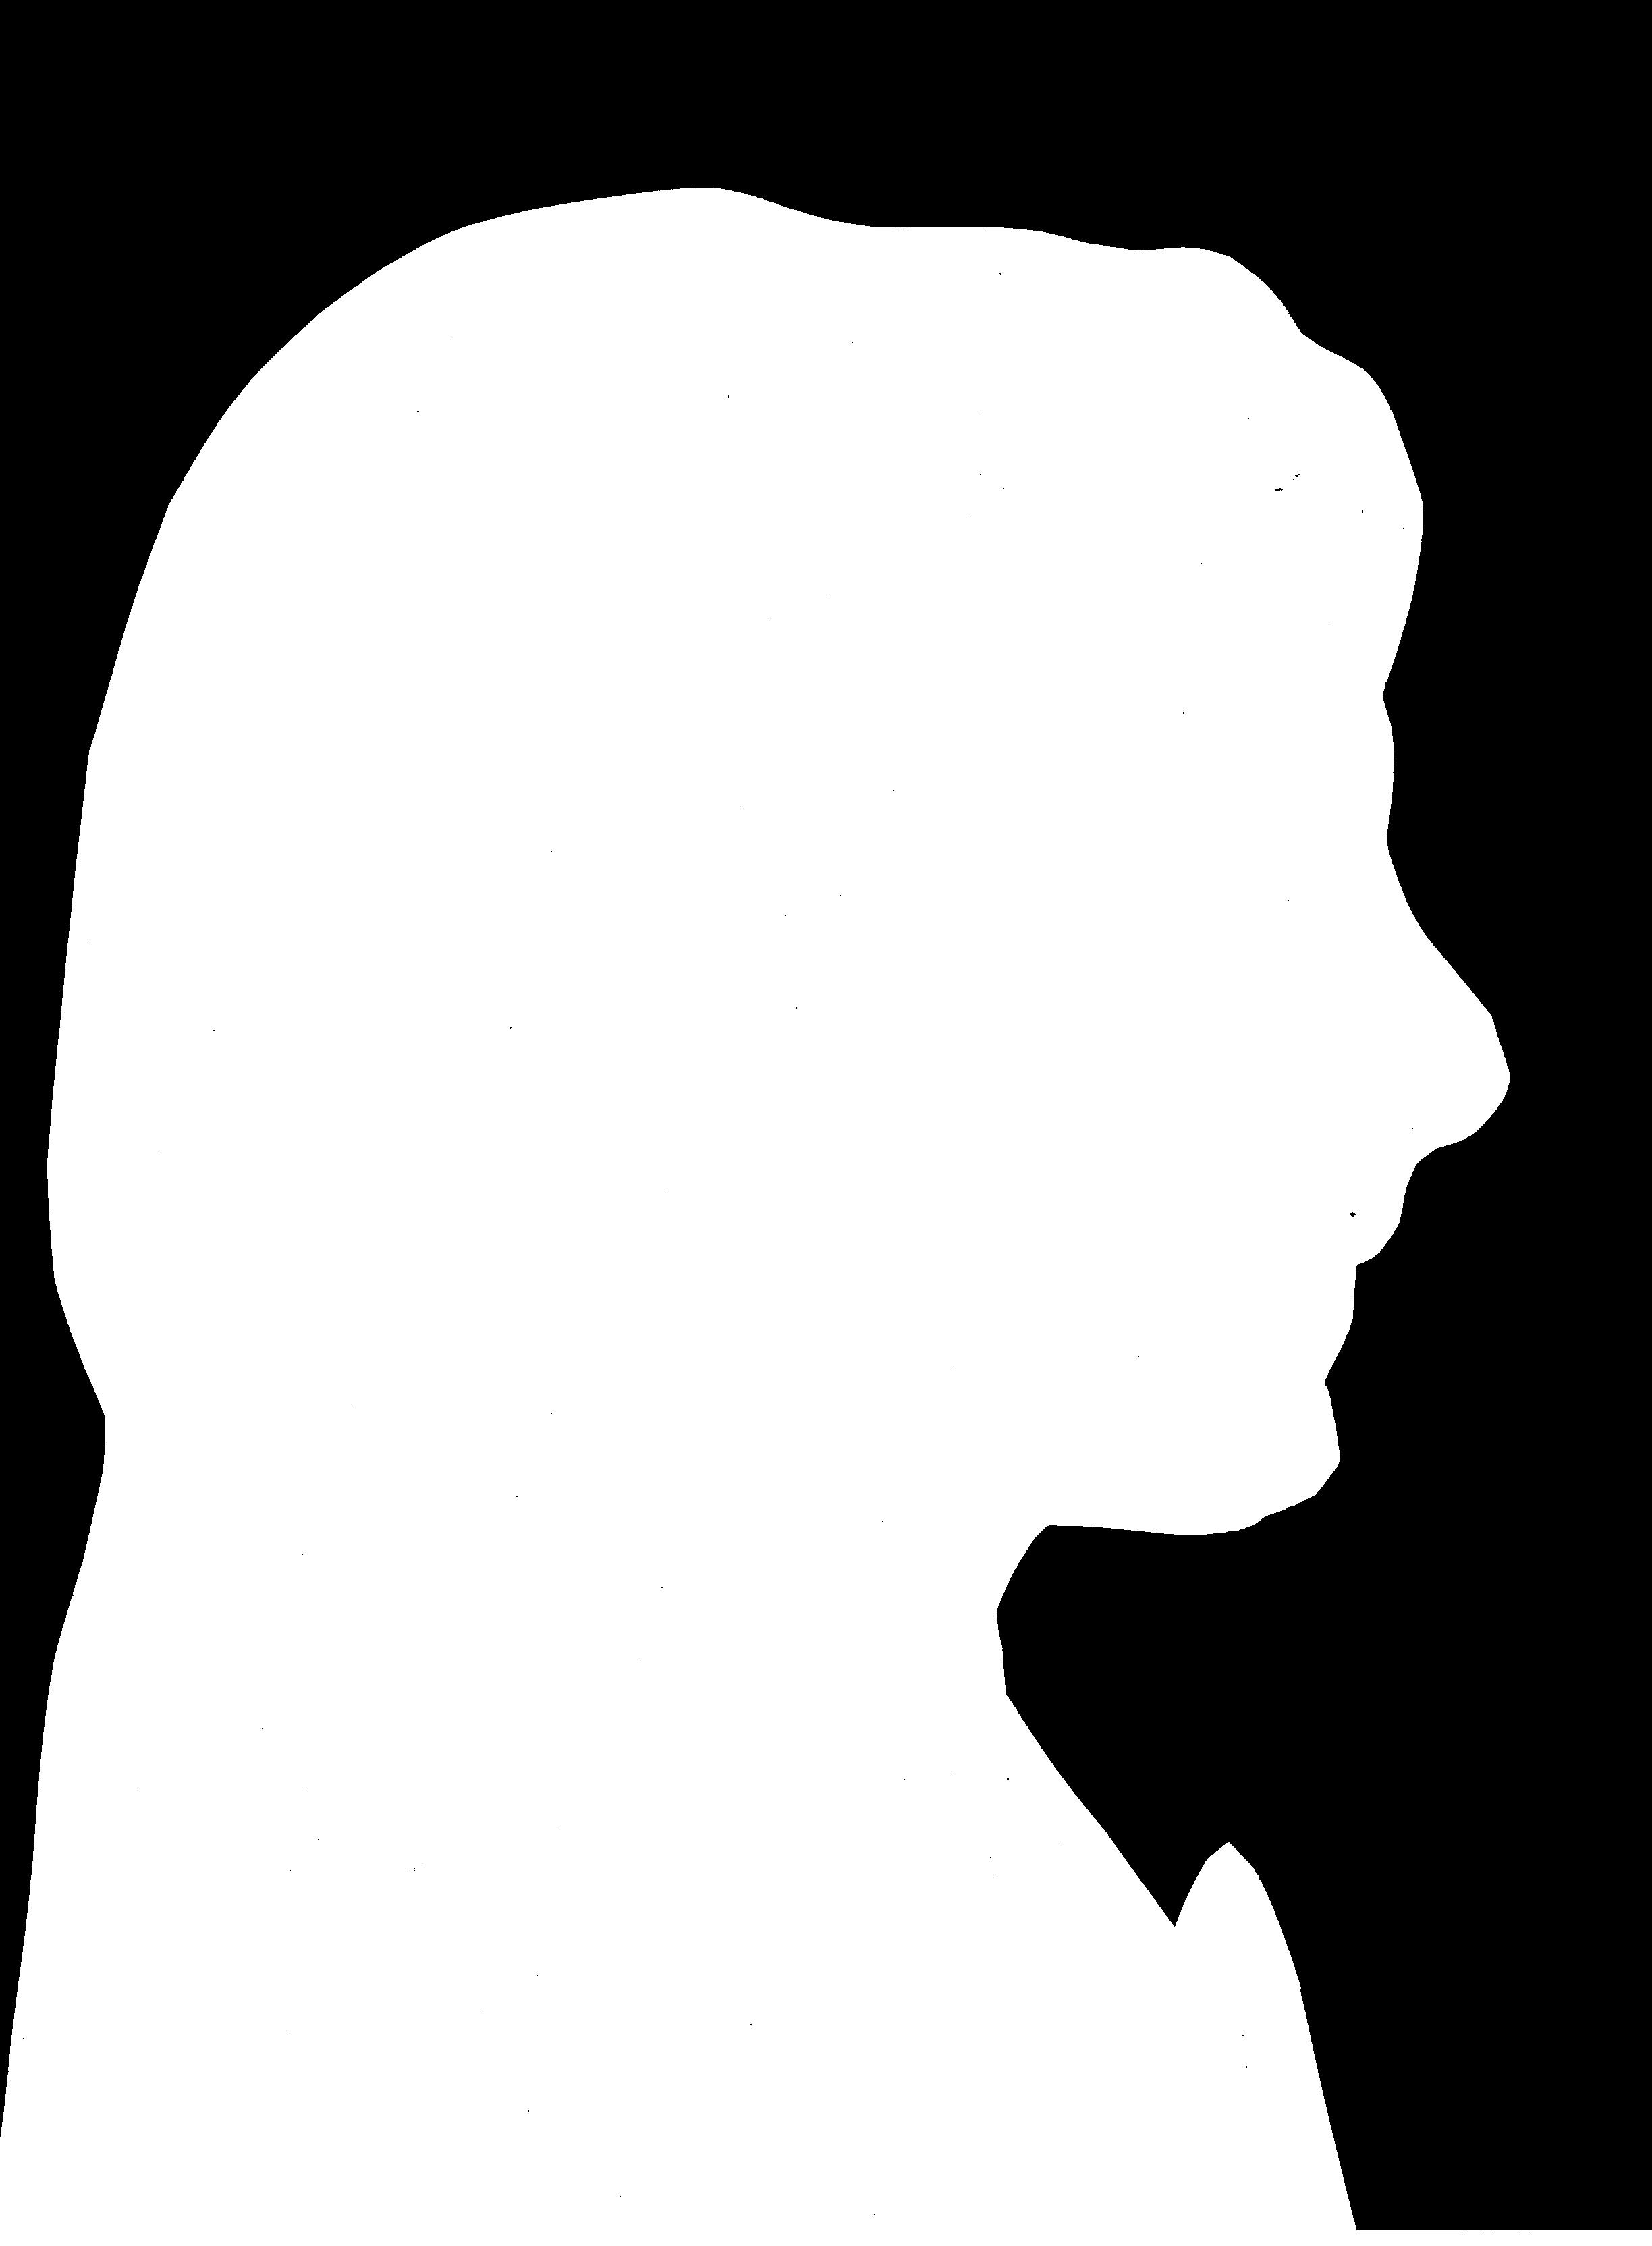 Bea's Reverse Silhouette